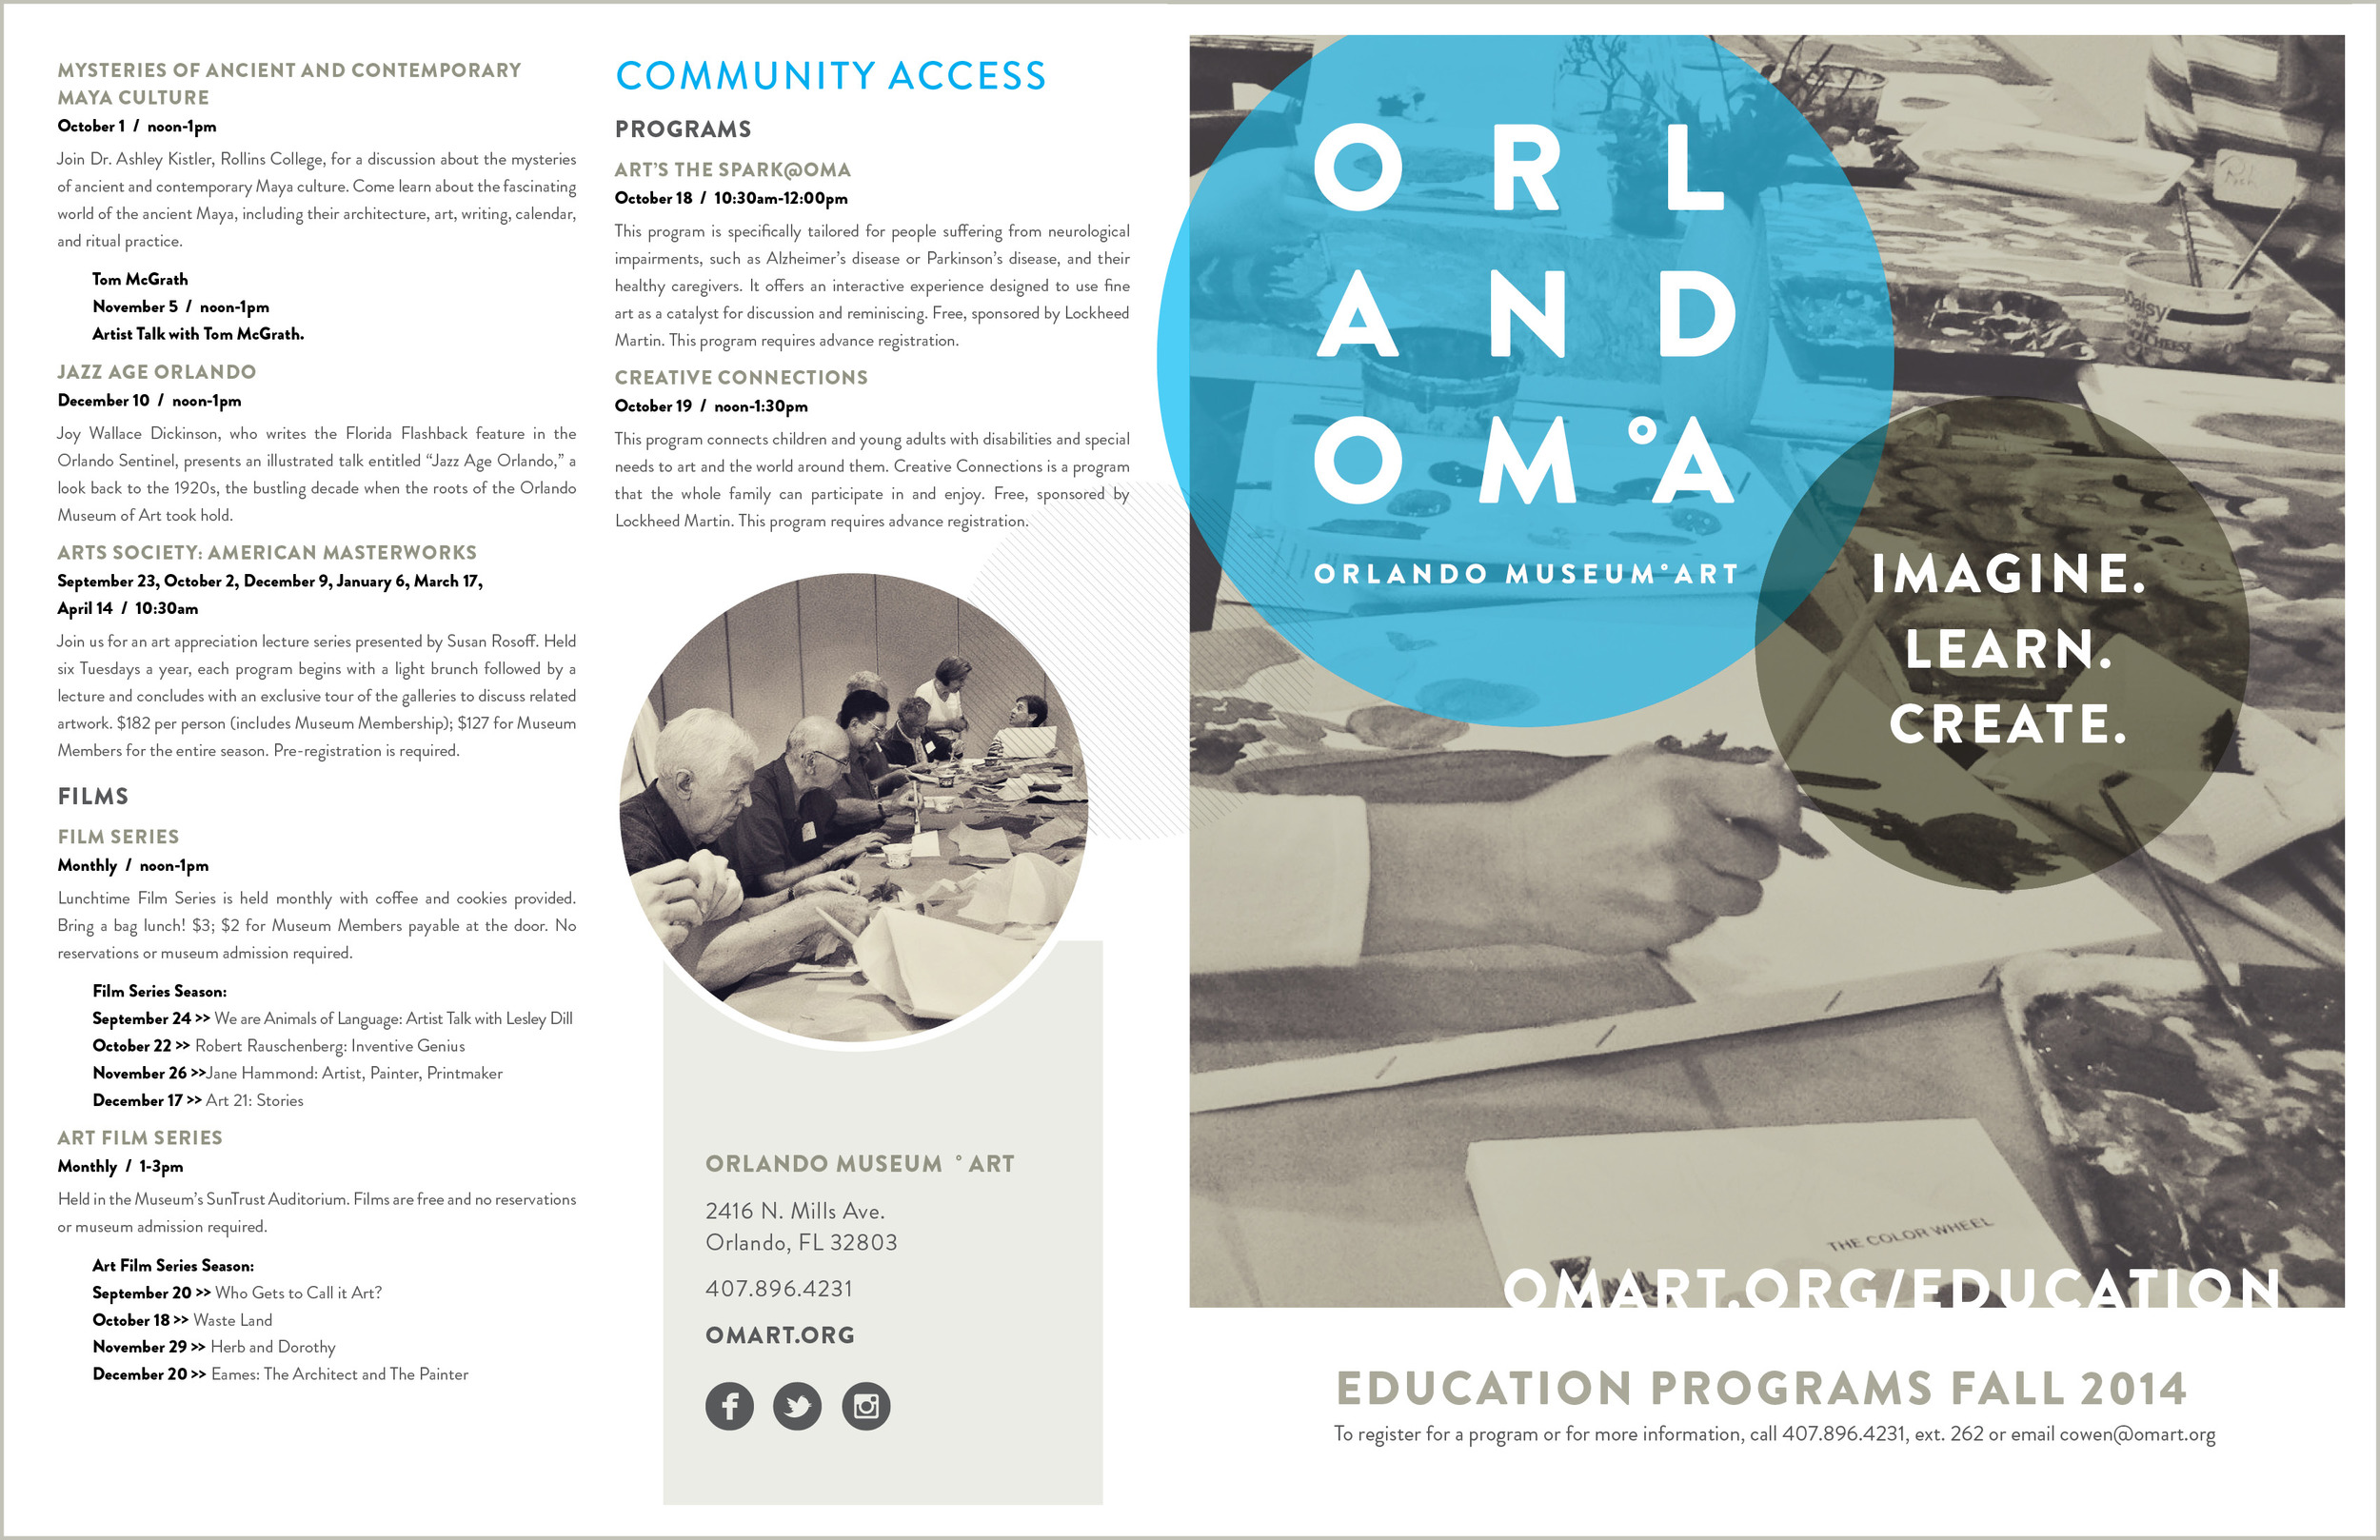 Orlando Museum of Art - Education 11 x 17 Folded Fall Program